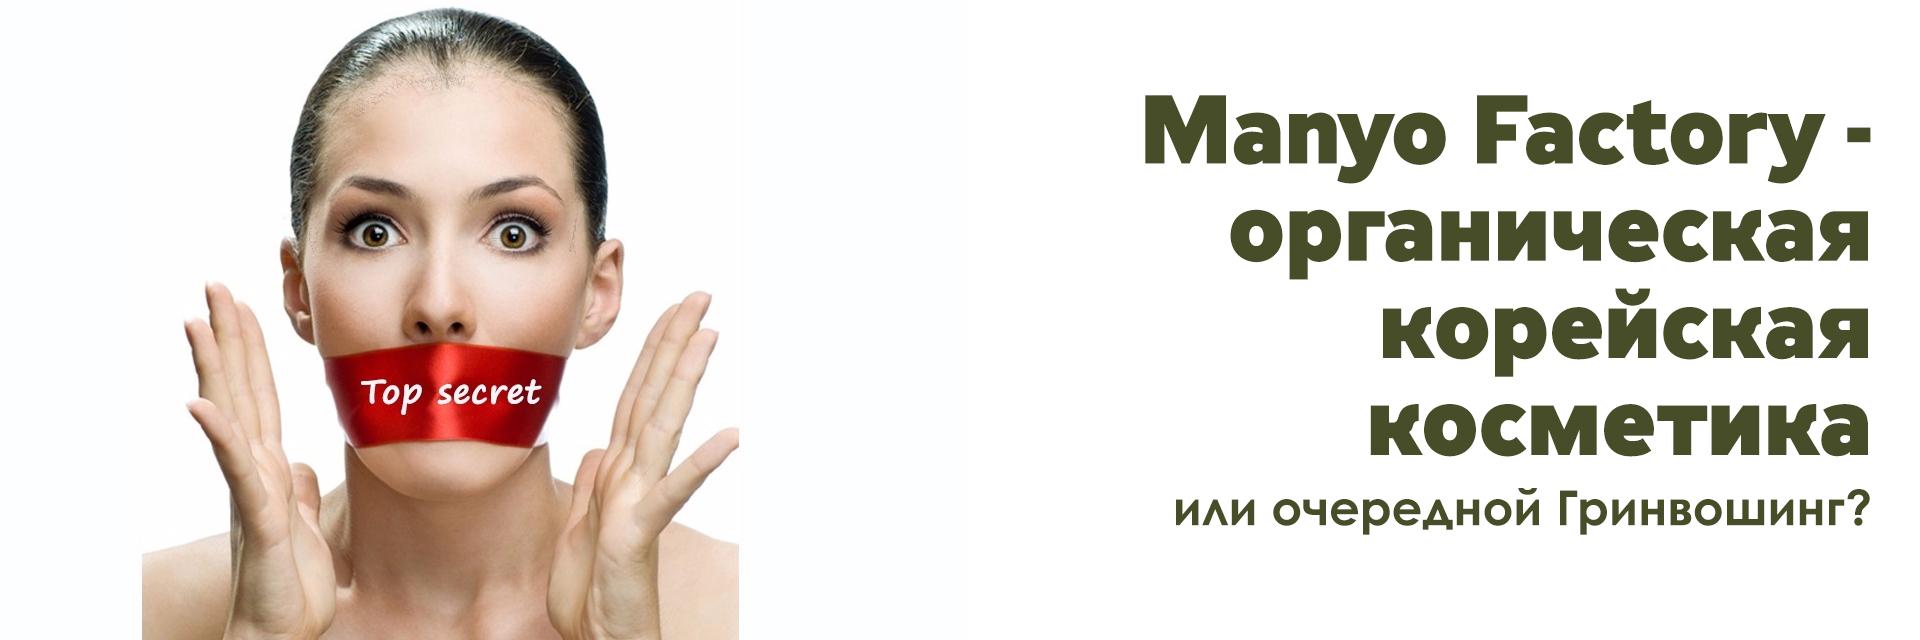 Manyo Factory корейская косметика